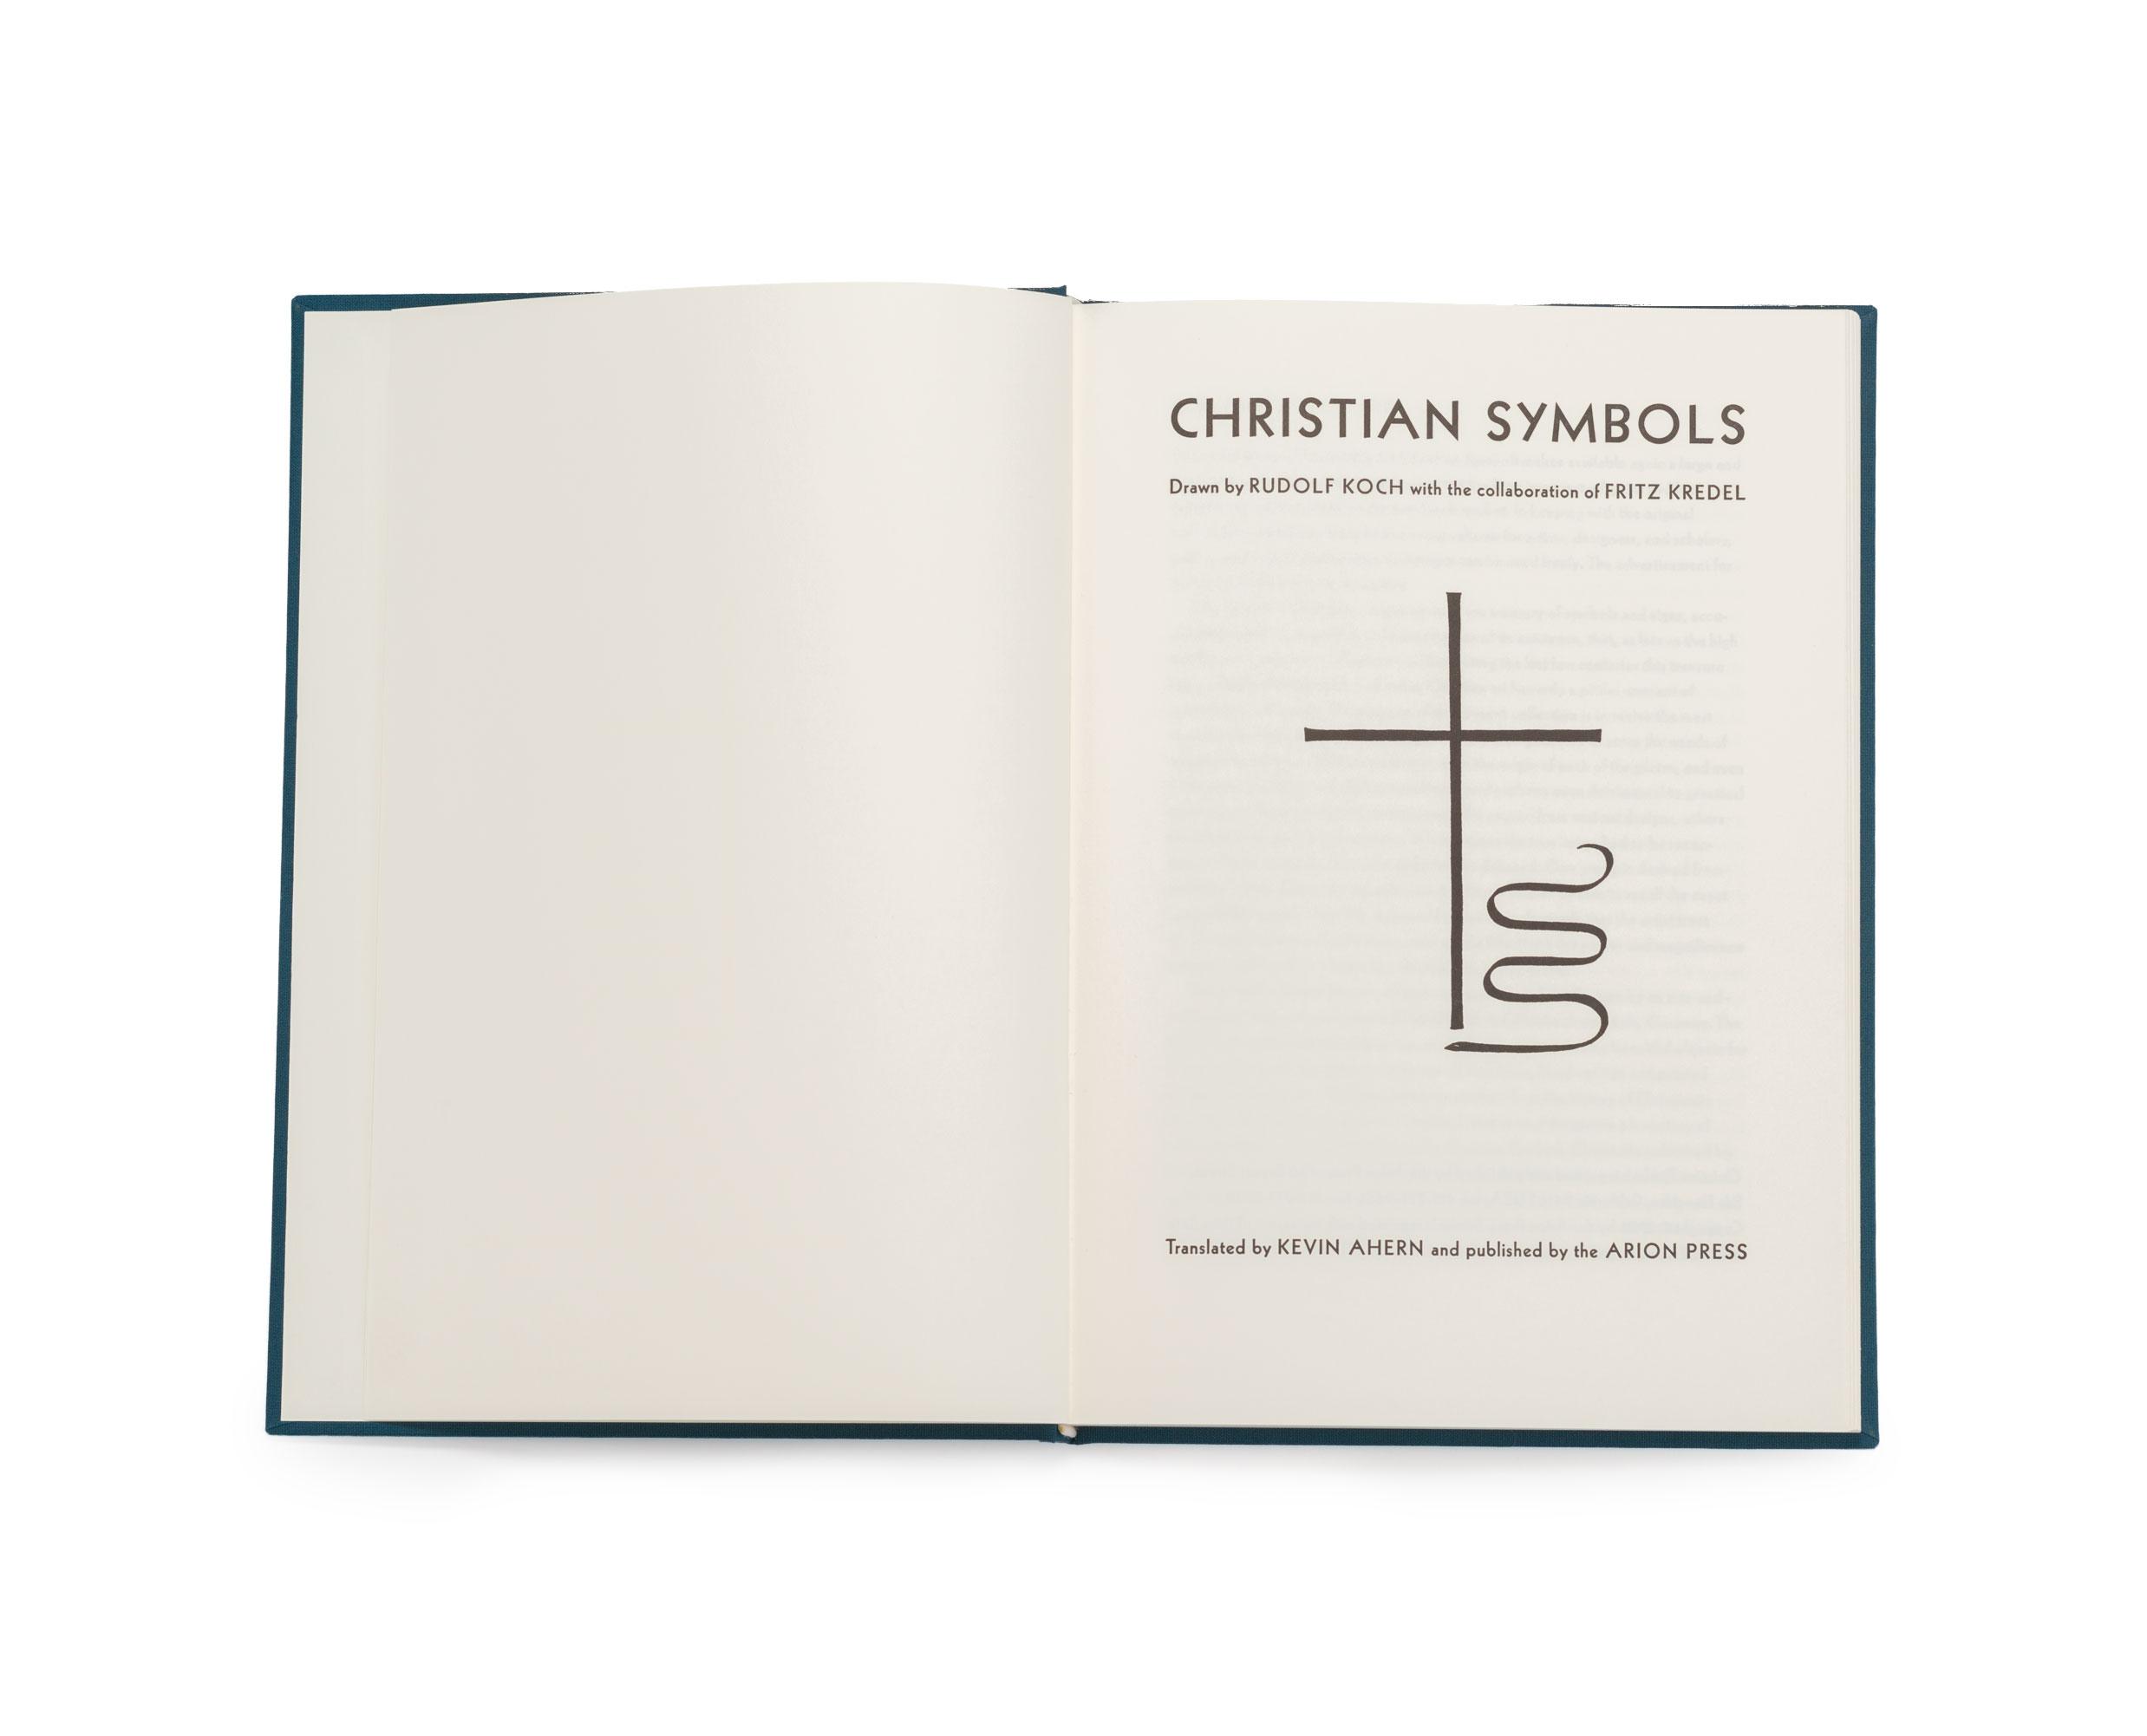 049_Christian-Symbols-02-fix.jpg